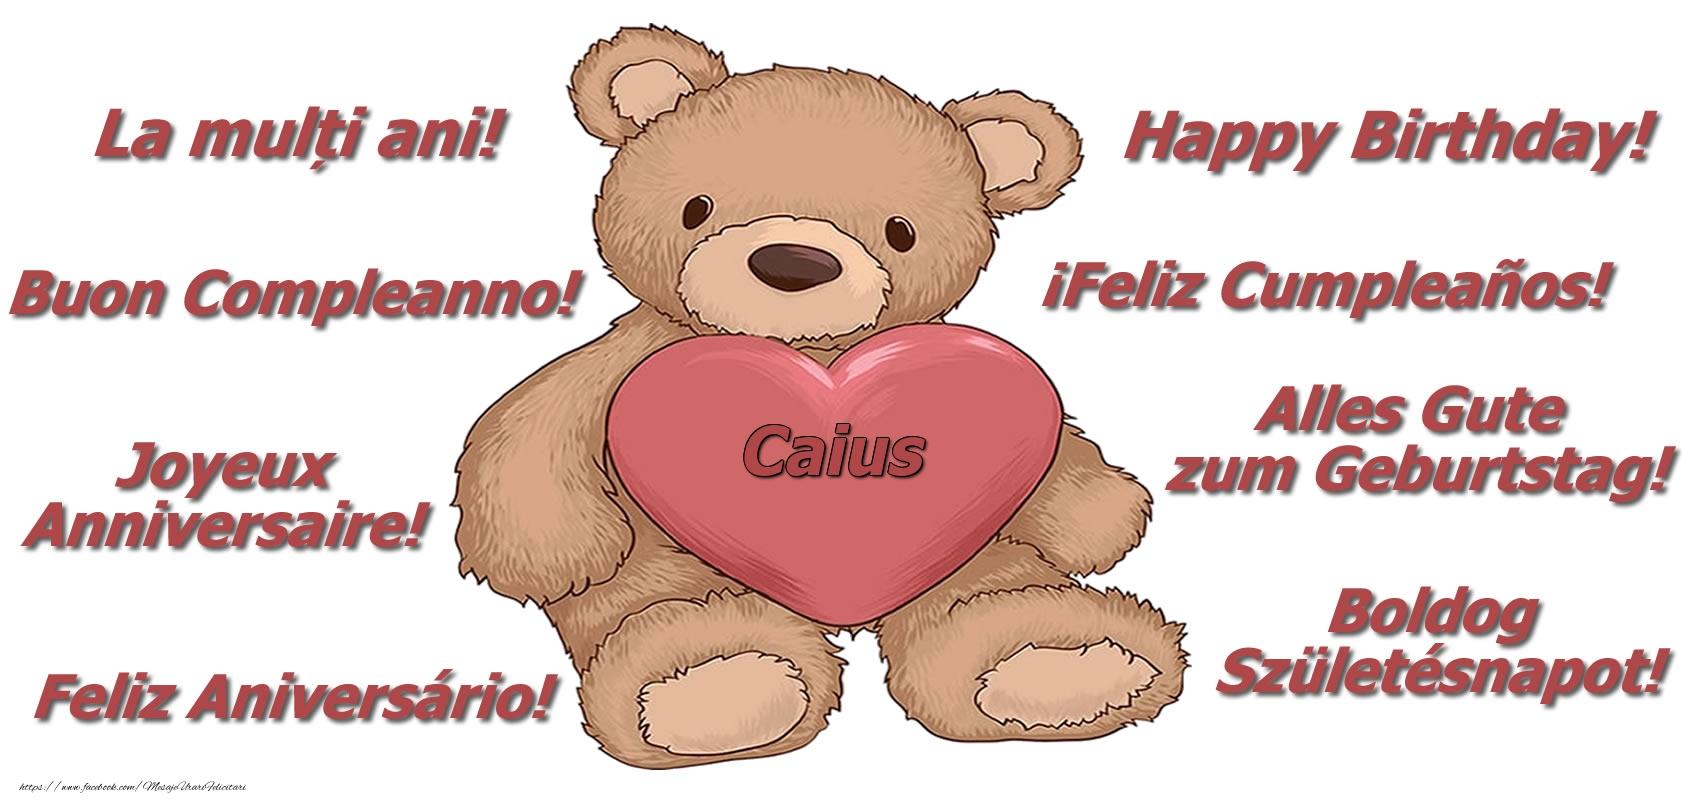 Felicitari de zi de nastere - La multi ani Caius! - Ursulet